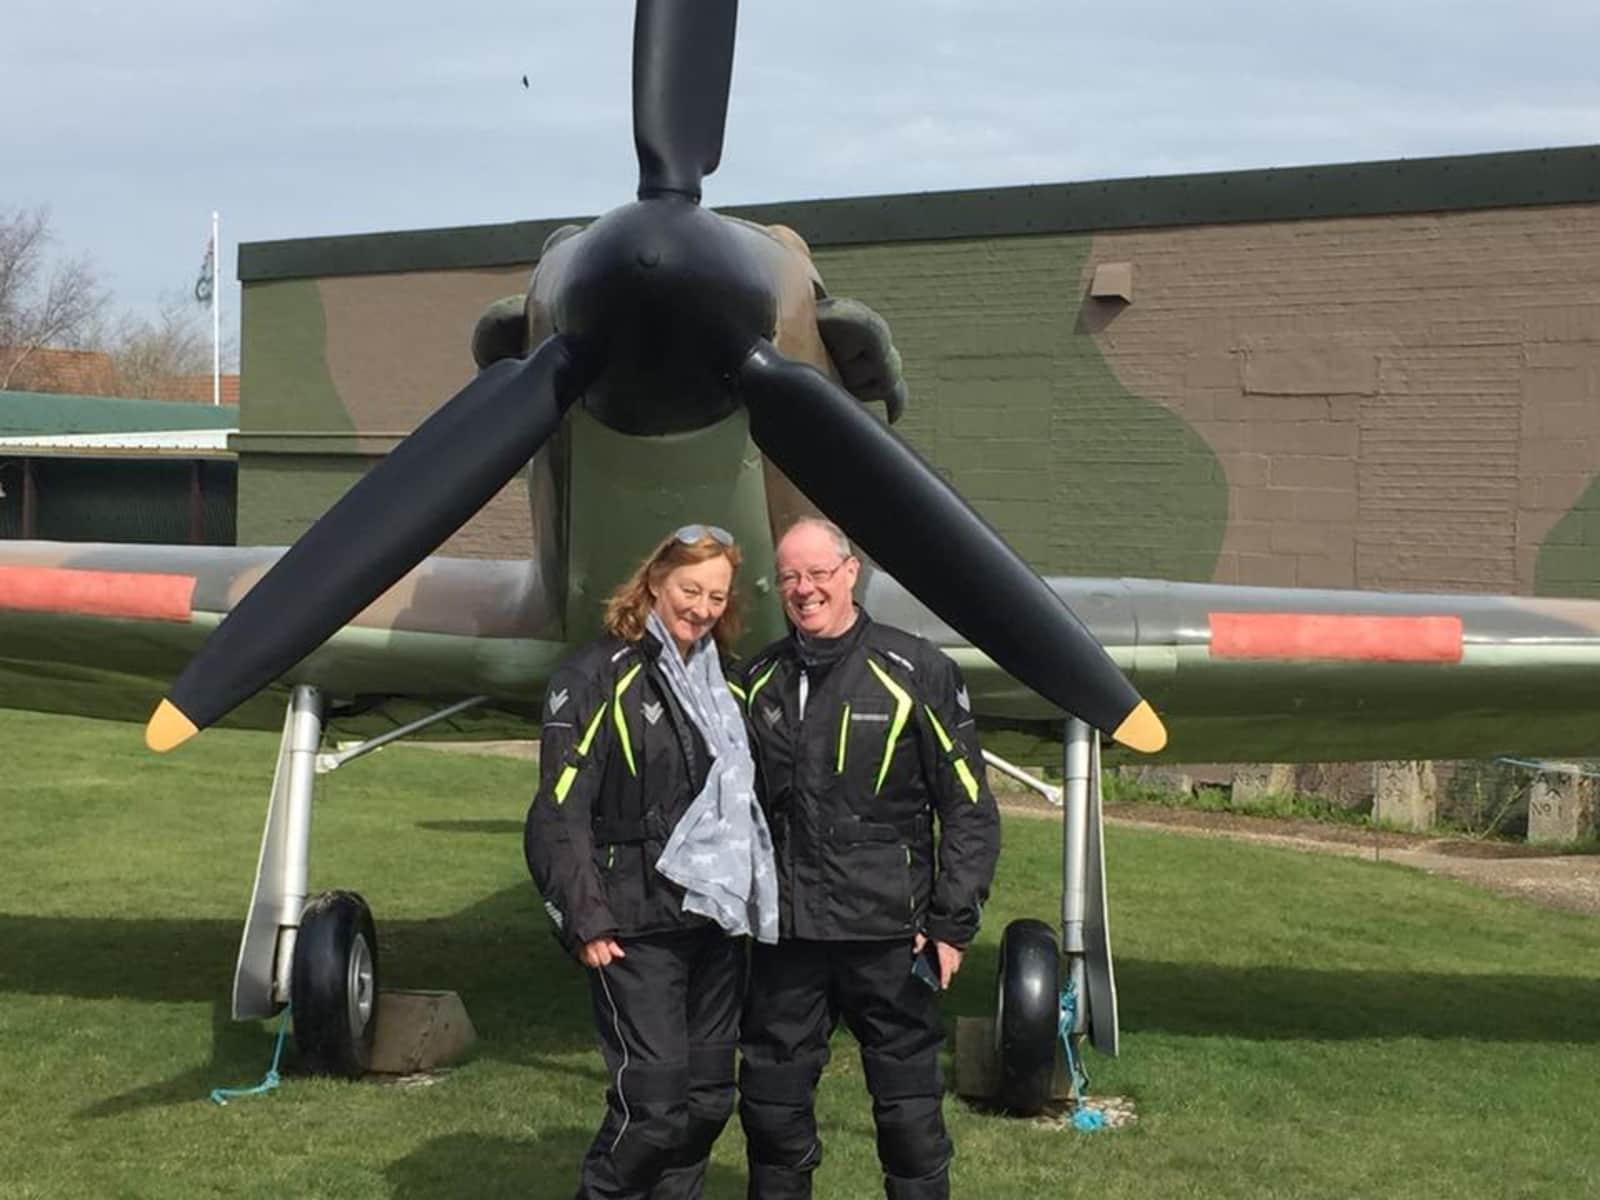 Peter & Carol from Hawkhurst, United Kingdom